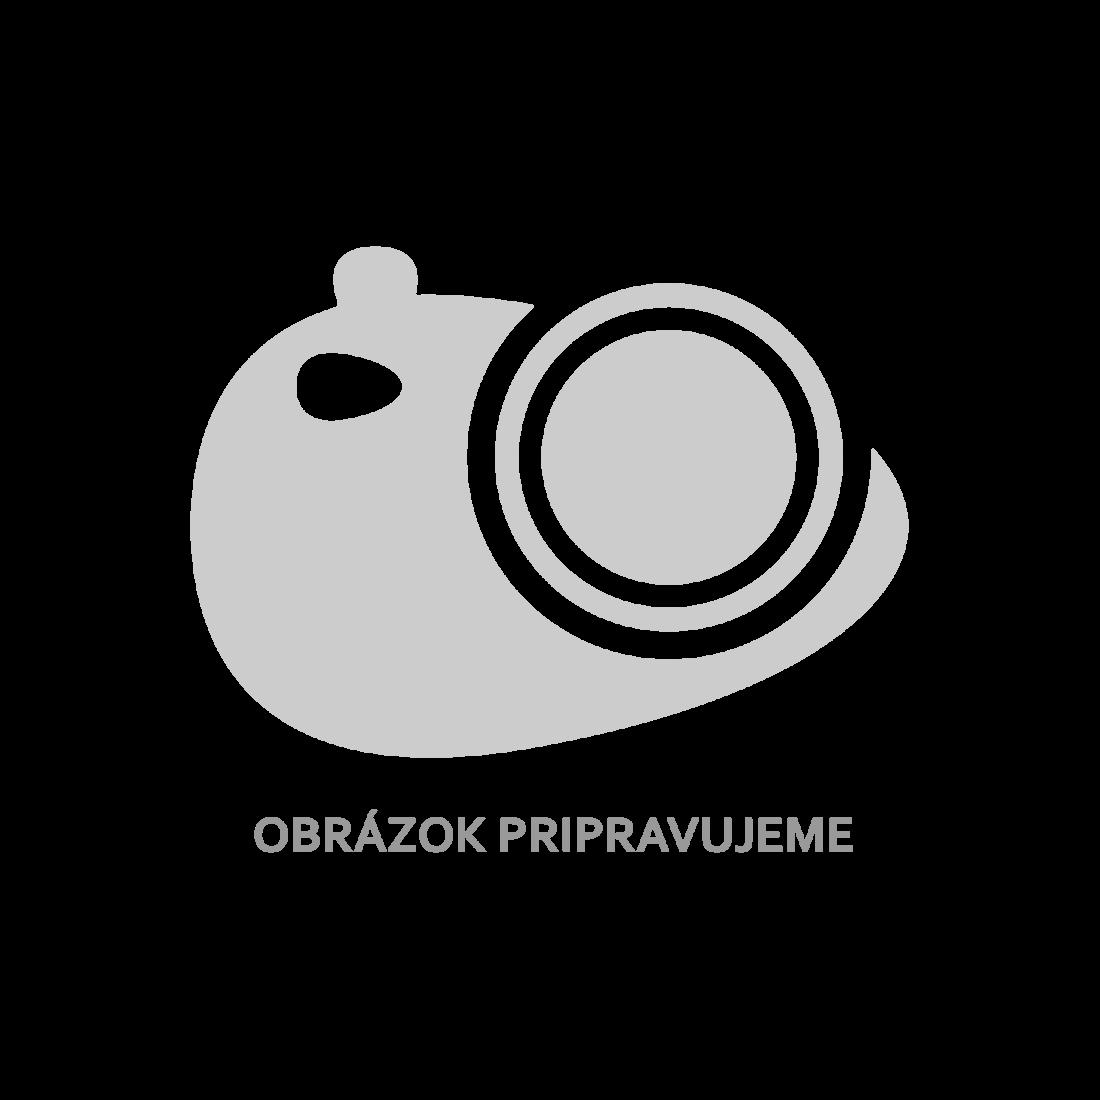 vidaXL Koupelnová skříňka šedá 30 x 30 x 183,5 cm dřevotříska [802599]